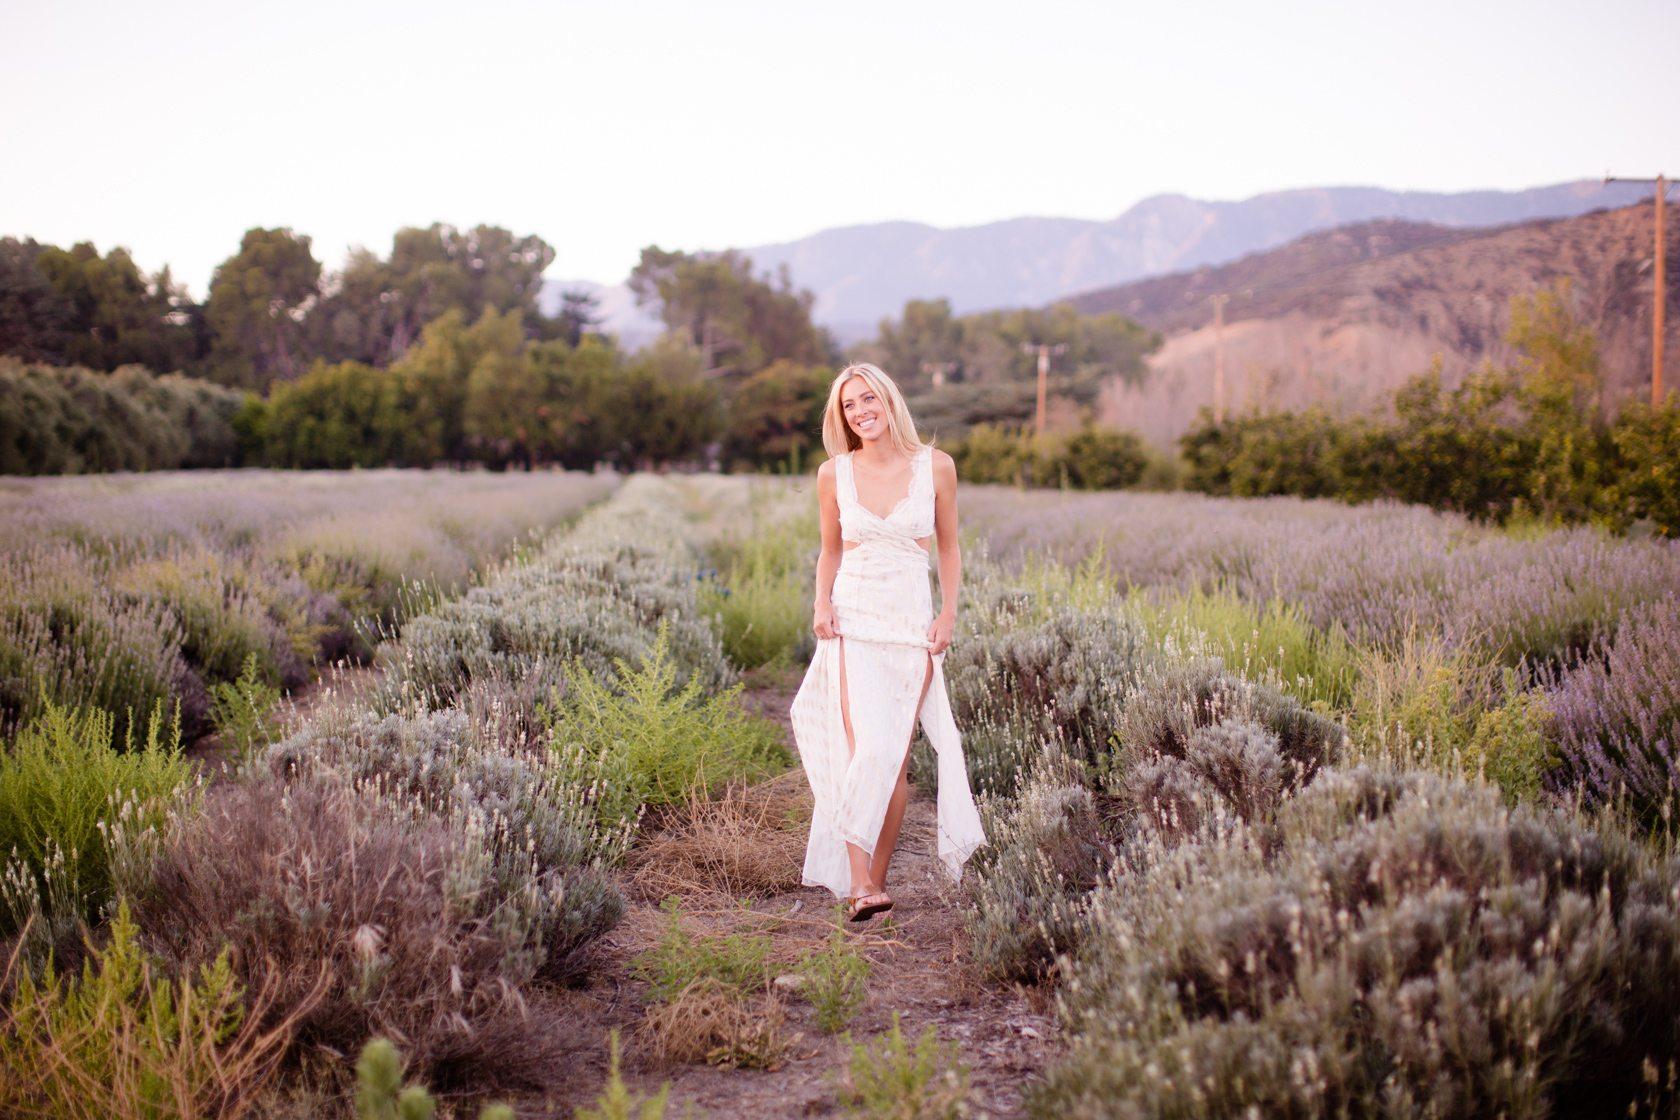 Highland_Springs_Lavender_Field_Engagement_20.jpg